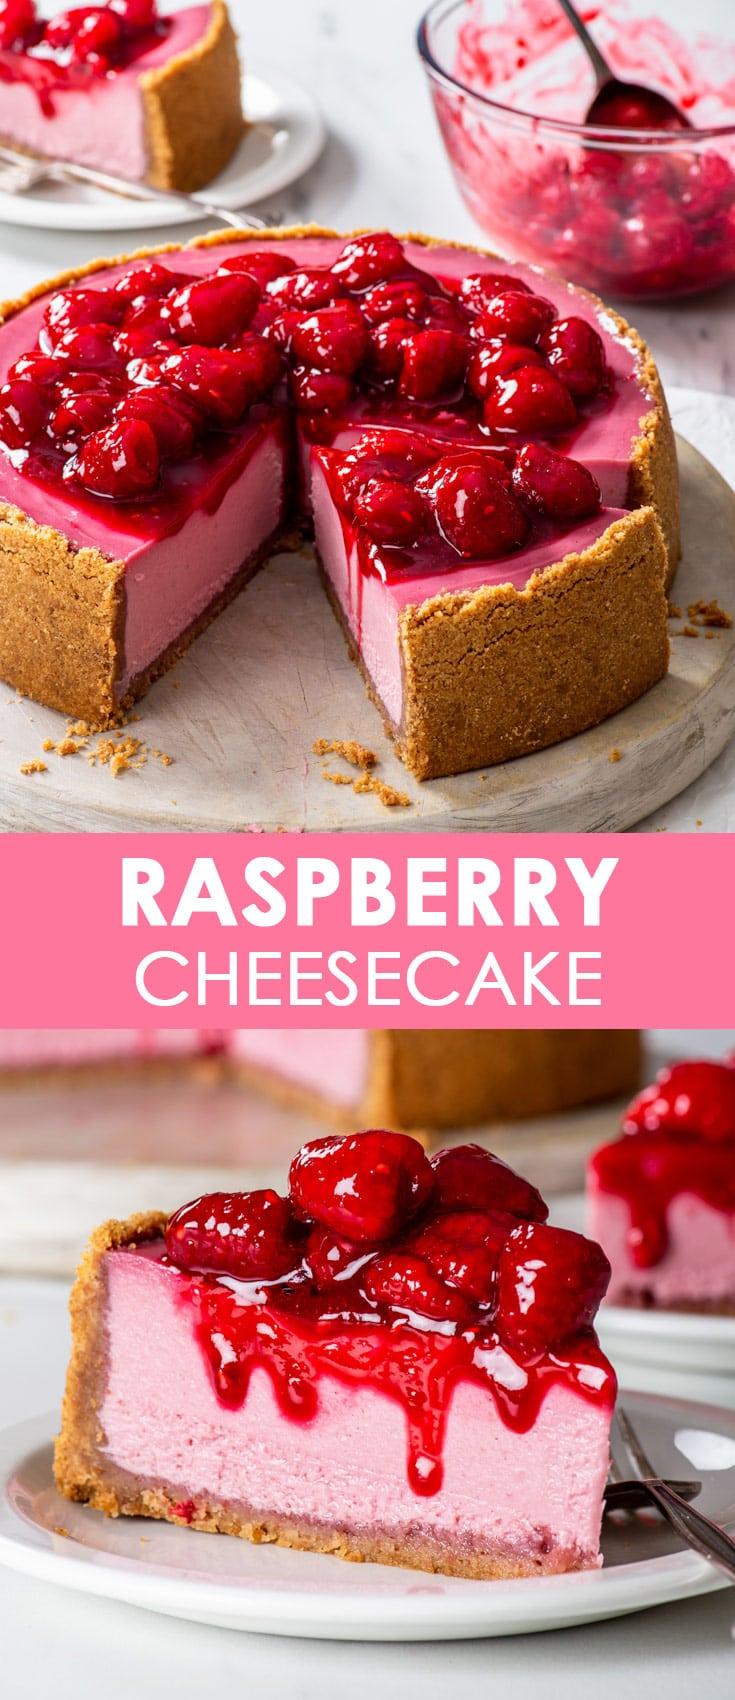 Pinterest image for raspberry cheesecake.